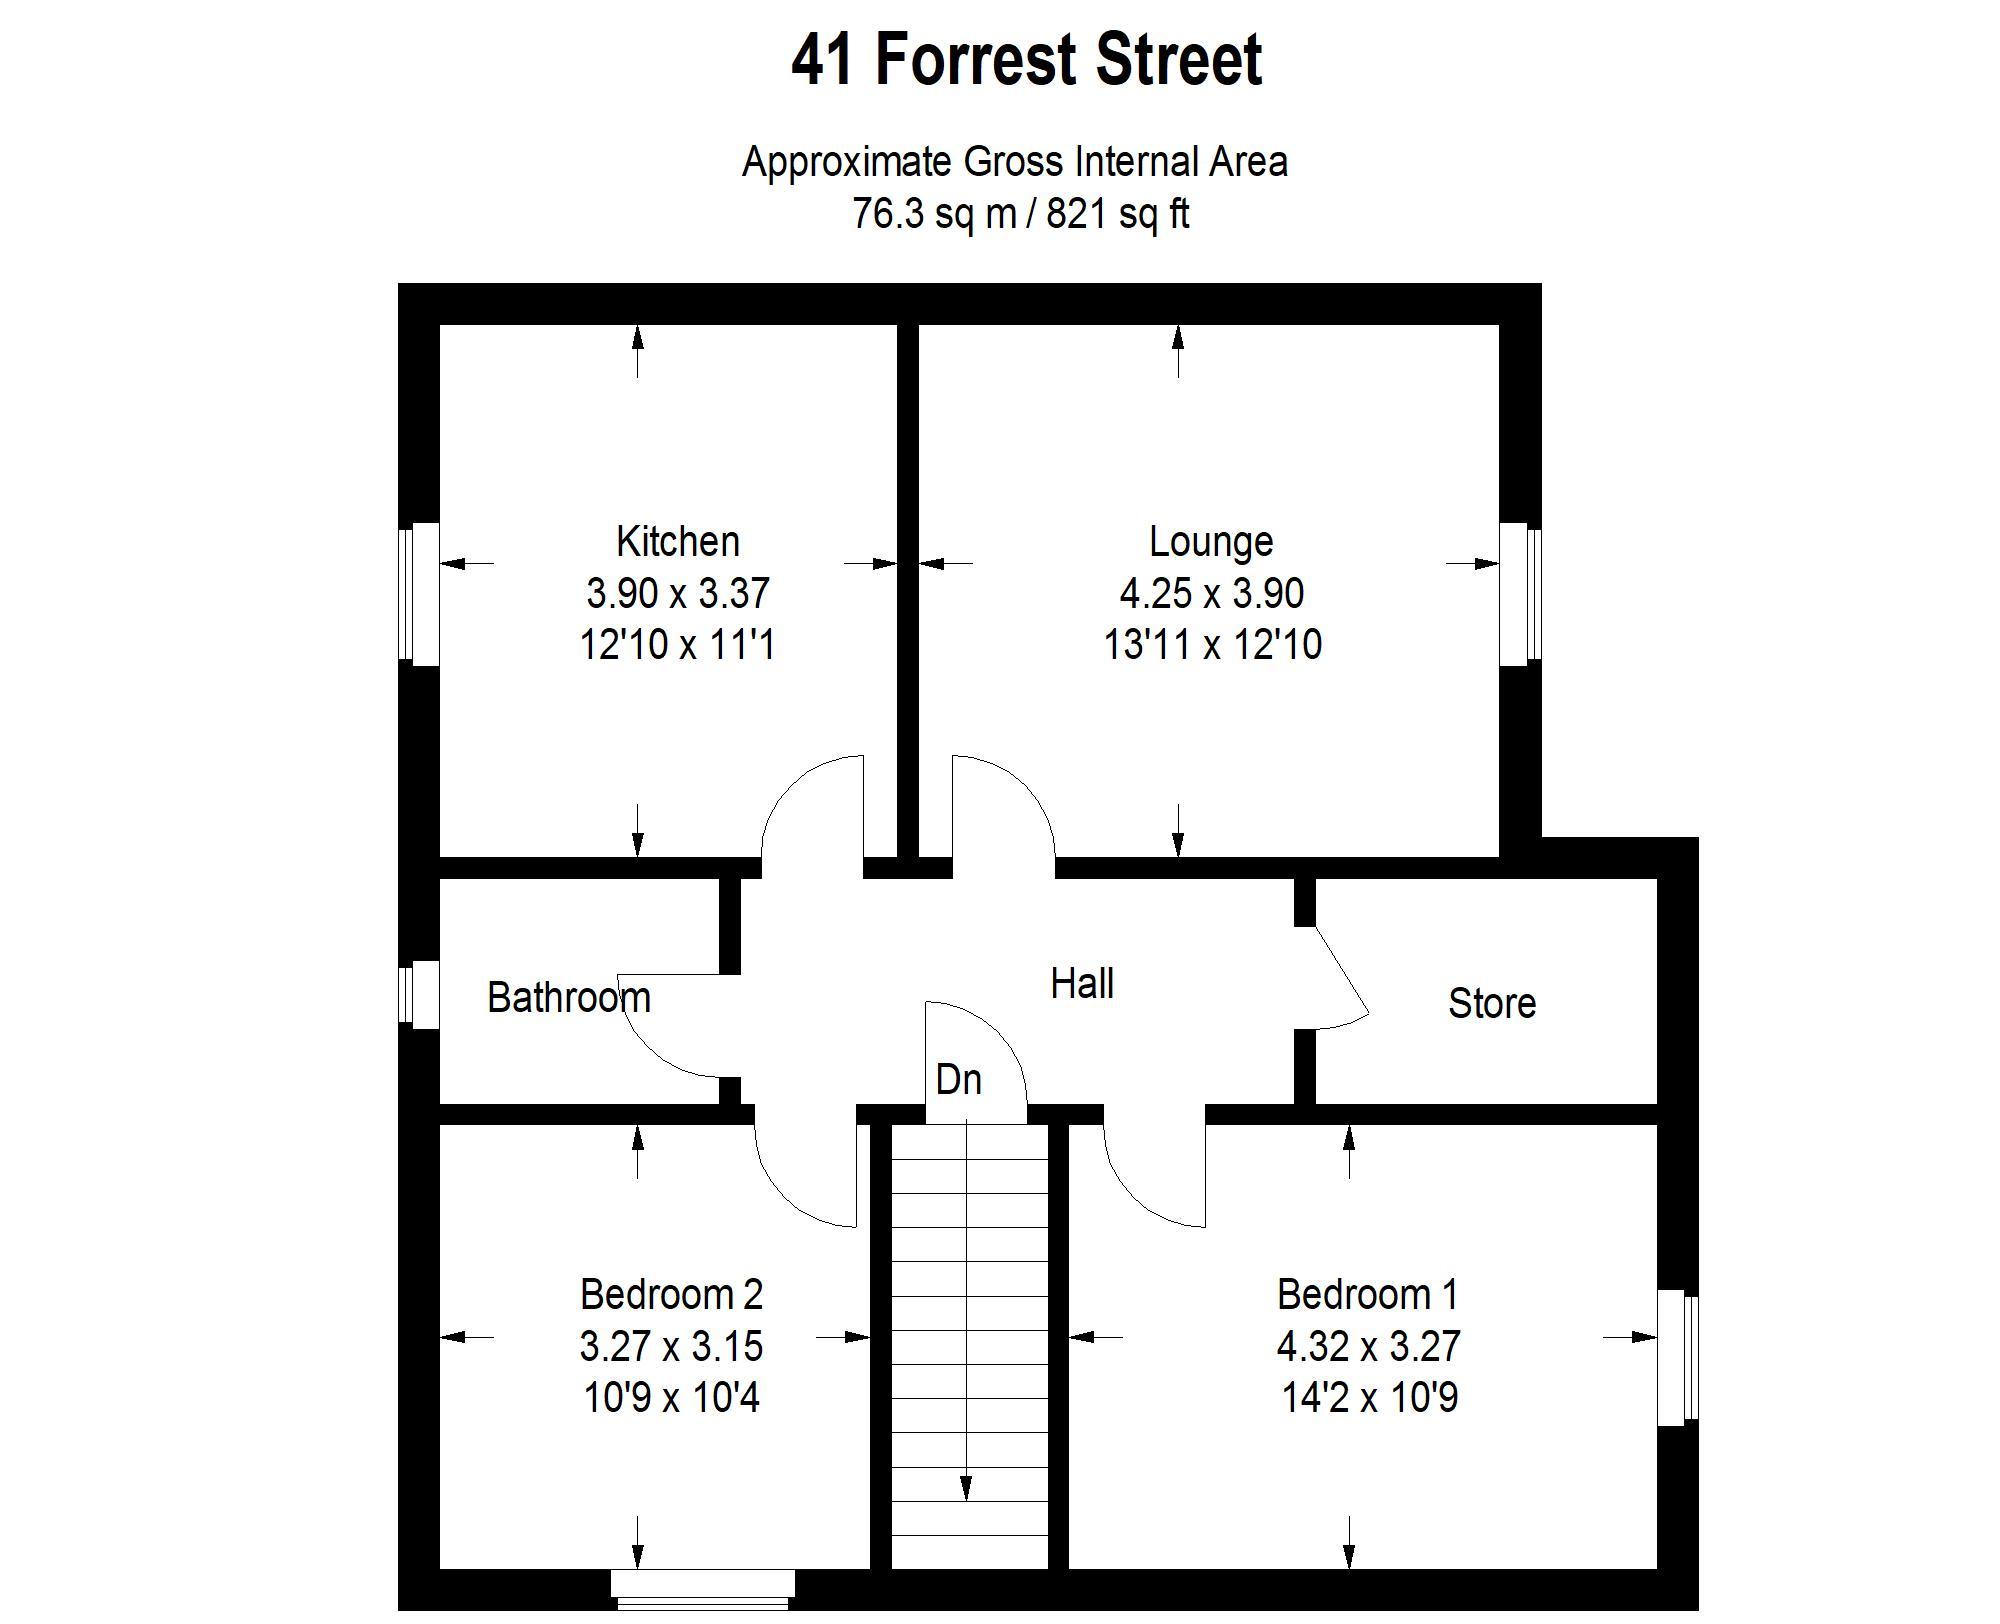 Forrest Street